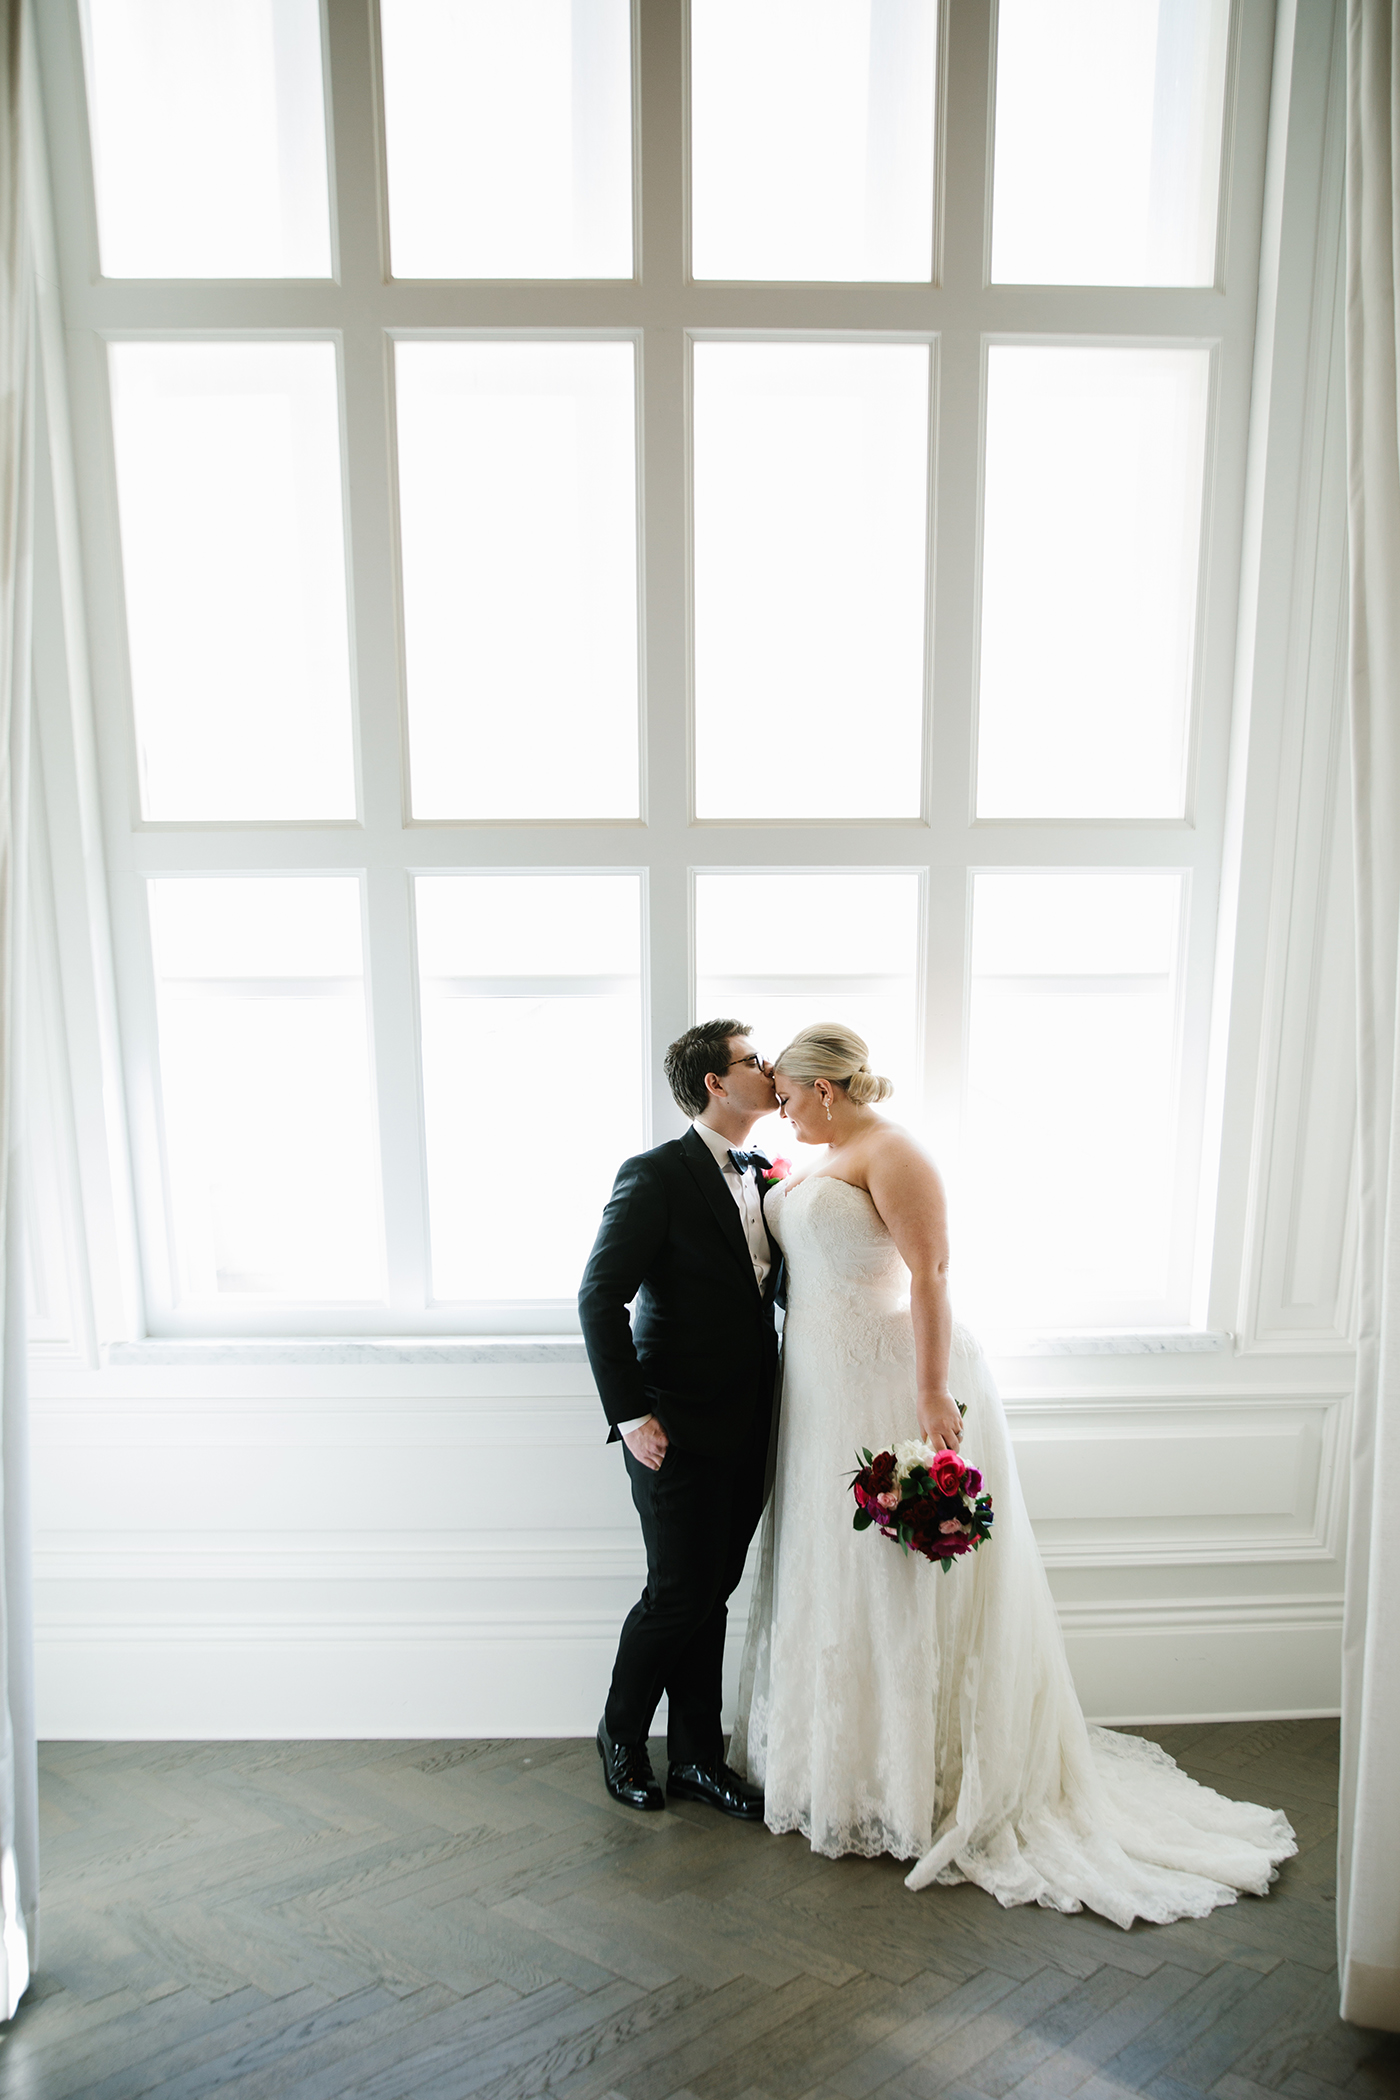 Dallas Weddings Planner - Allday Events - Katie + Matthew at The Adolphus Hotel - 175.jpg